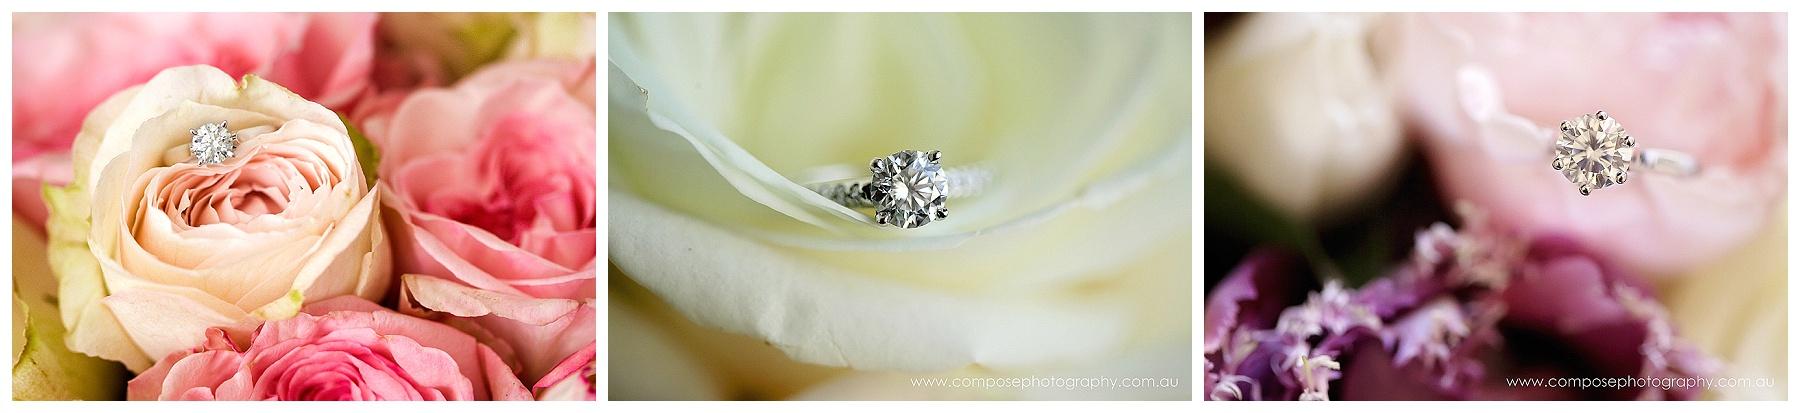 Brilliant cut engagement ring perth